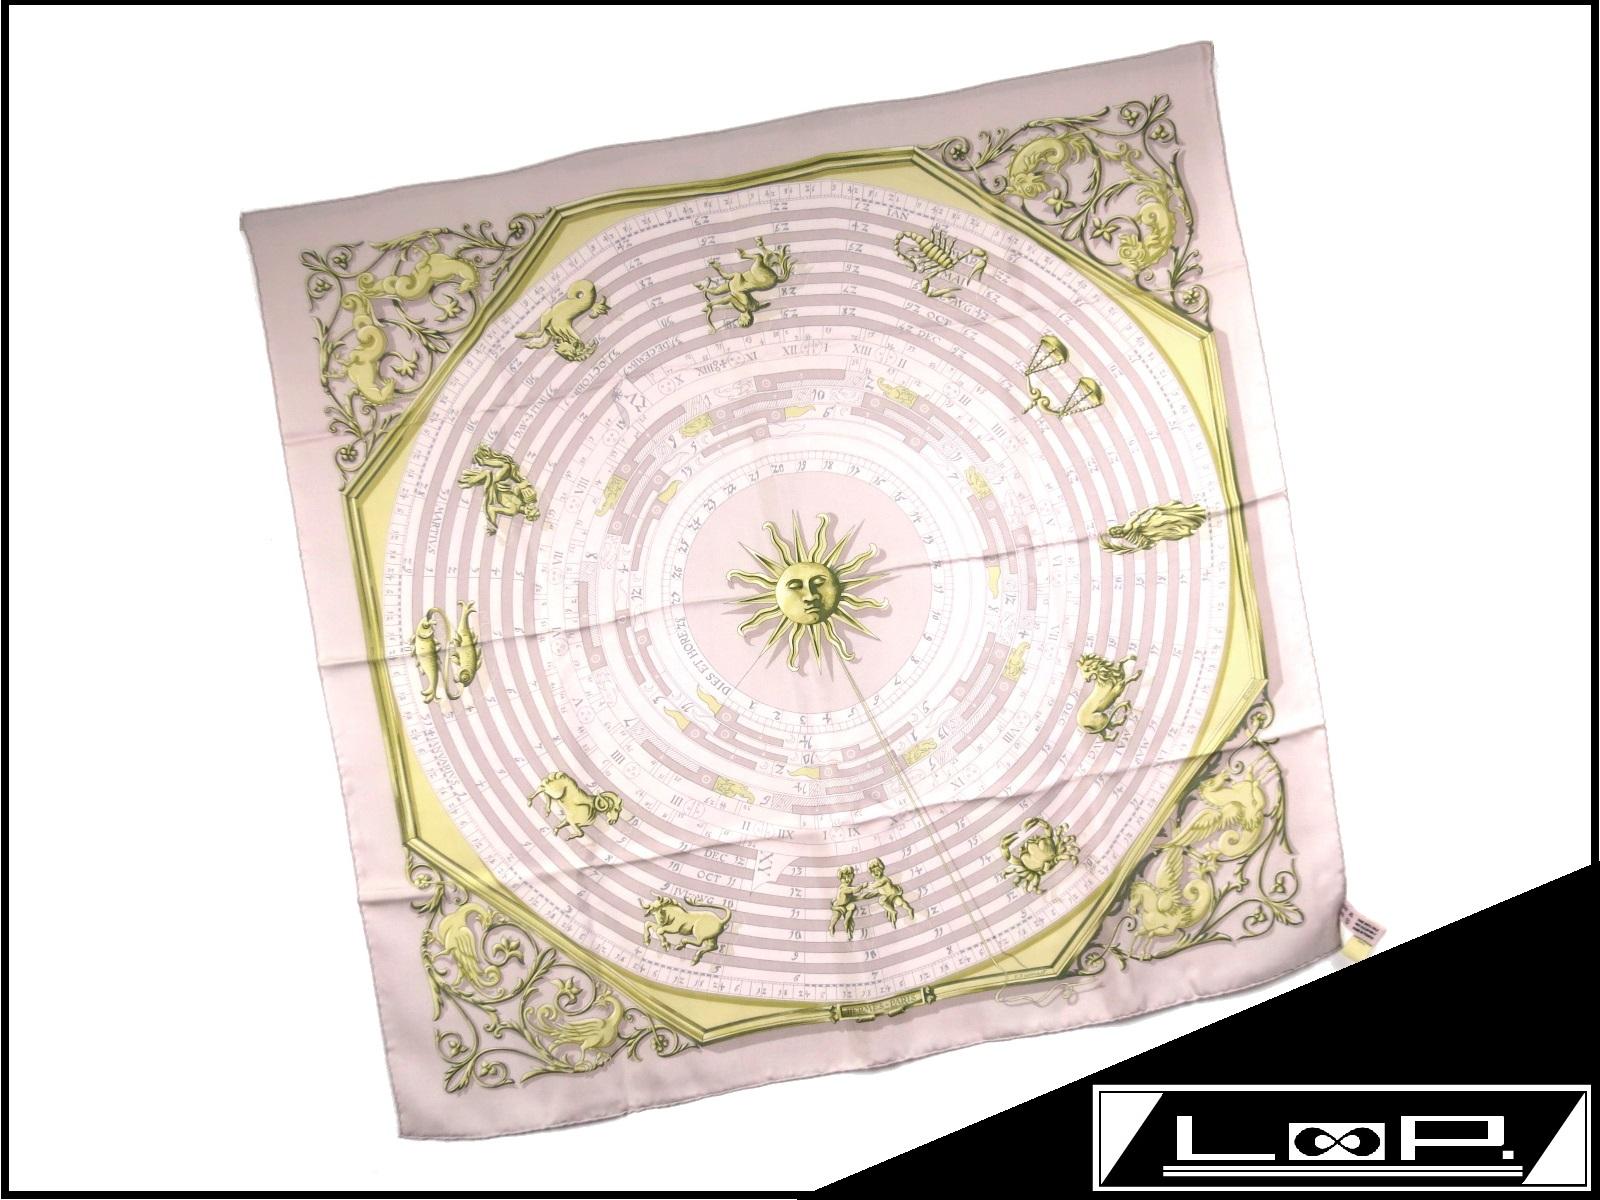 【SALE】【新同】 エルメス カレ 90 スカーフ ASTROLOGIE 占星術 星座 太陽 ピンク シルク 【A17114】 【中古】